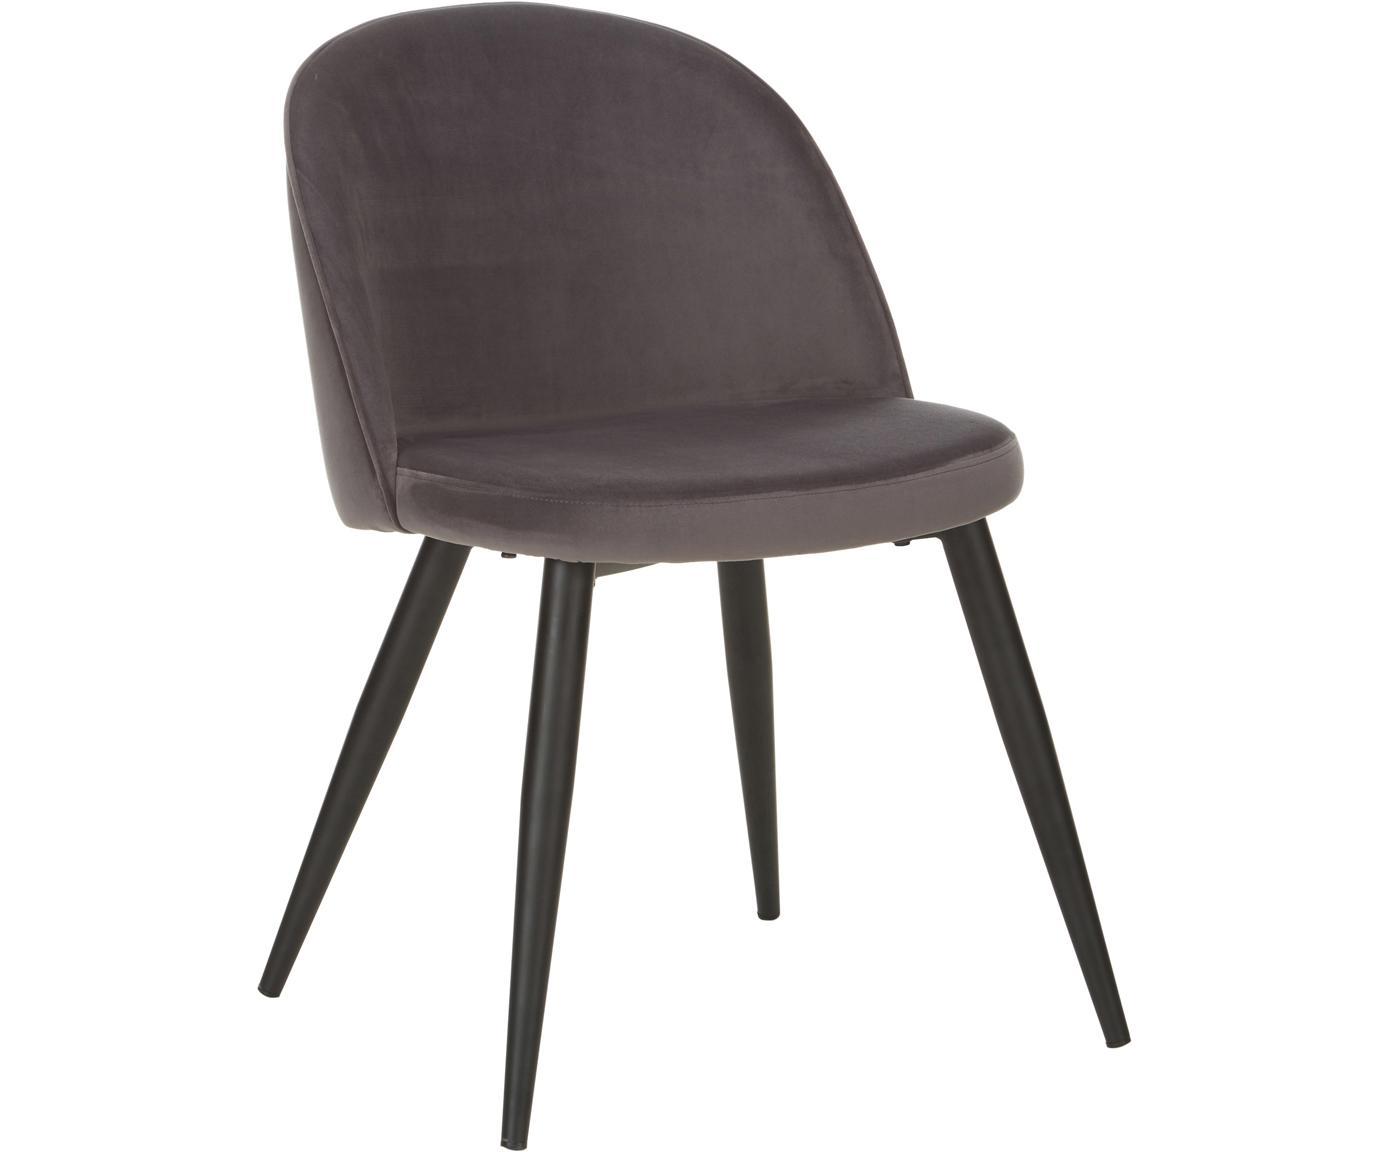 Moderne fluwelen stoelen Amy, 2 stuks, Bekleding: fluweel (polyester), Poten: gepoedercoat metaal, Donkergrijs, B 51 x D 55 cm